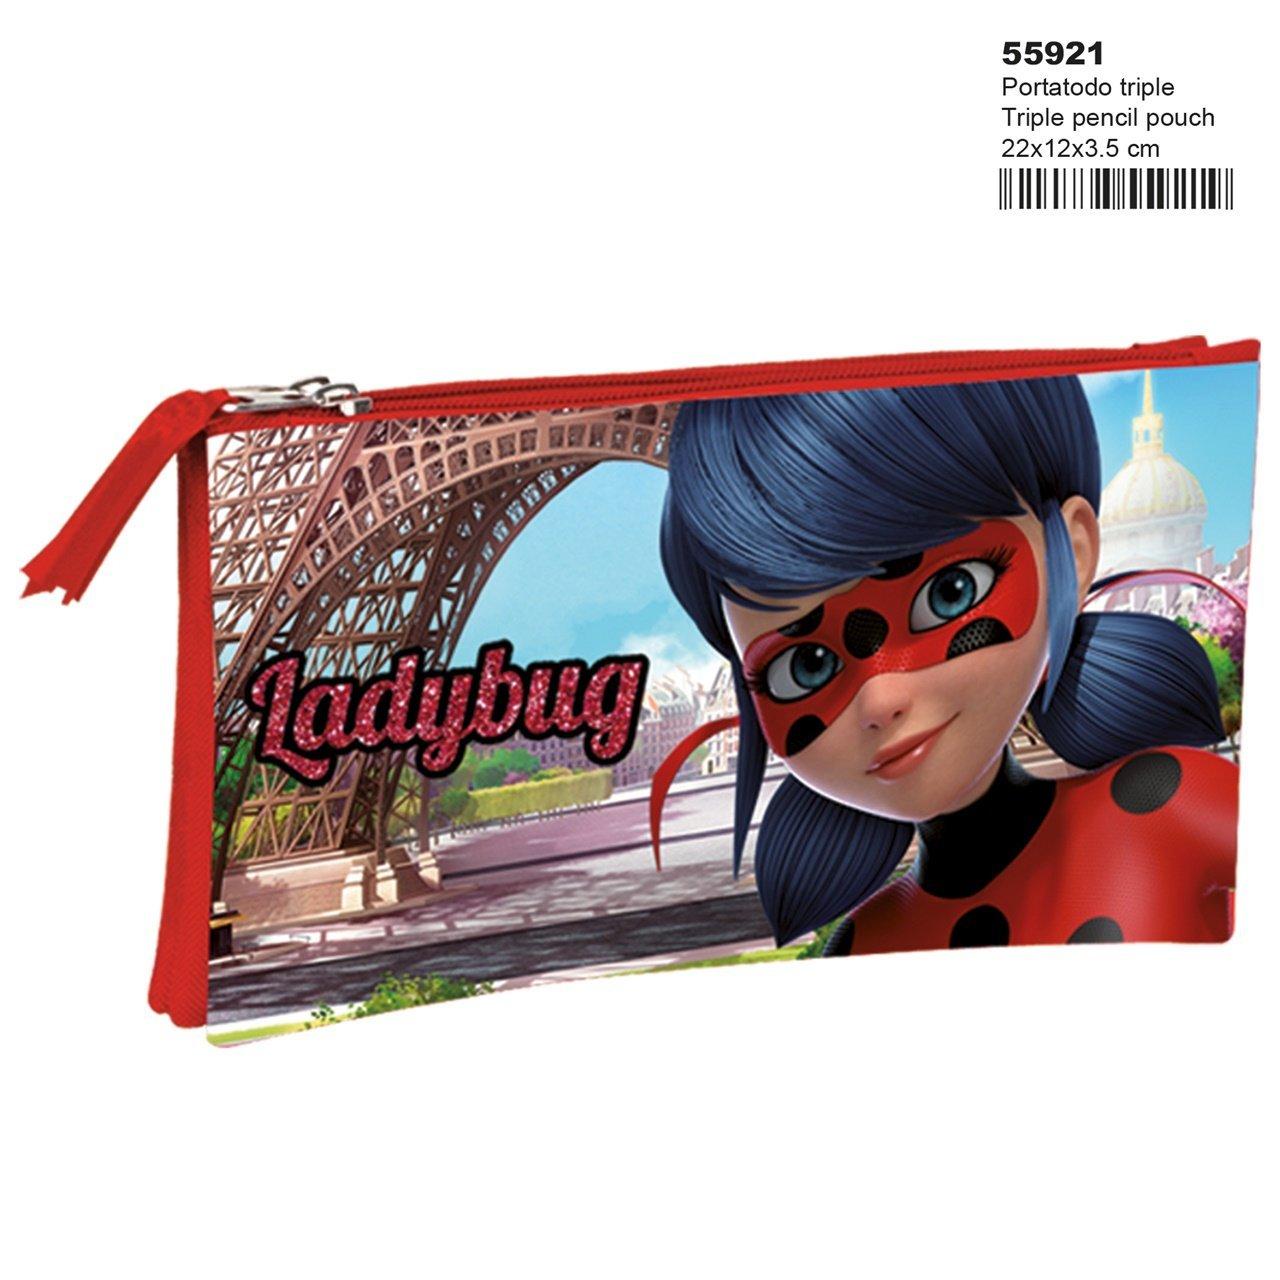 Montichelvo Ladybug Amour – Estuche portatodo Triple (Perona 55921)